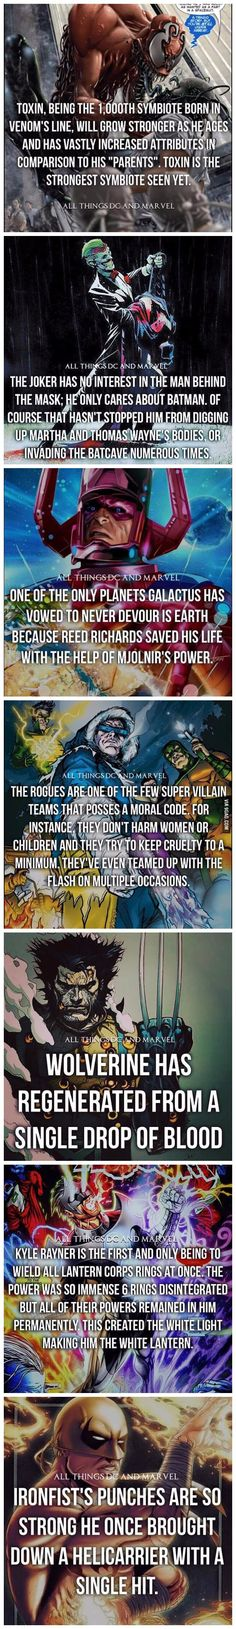 Superhero Facts: Part 3